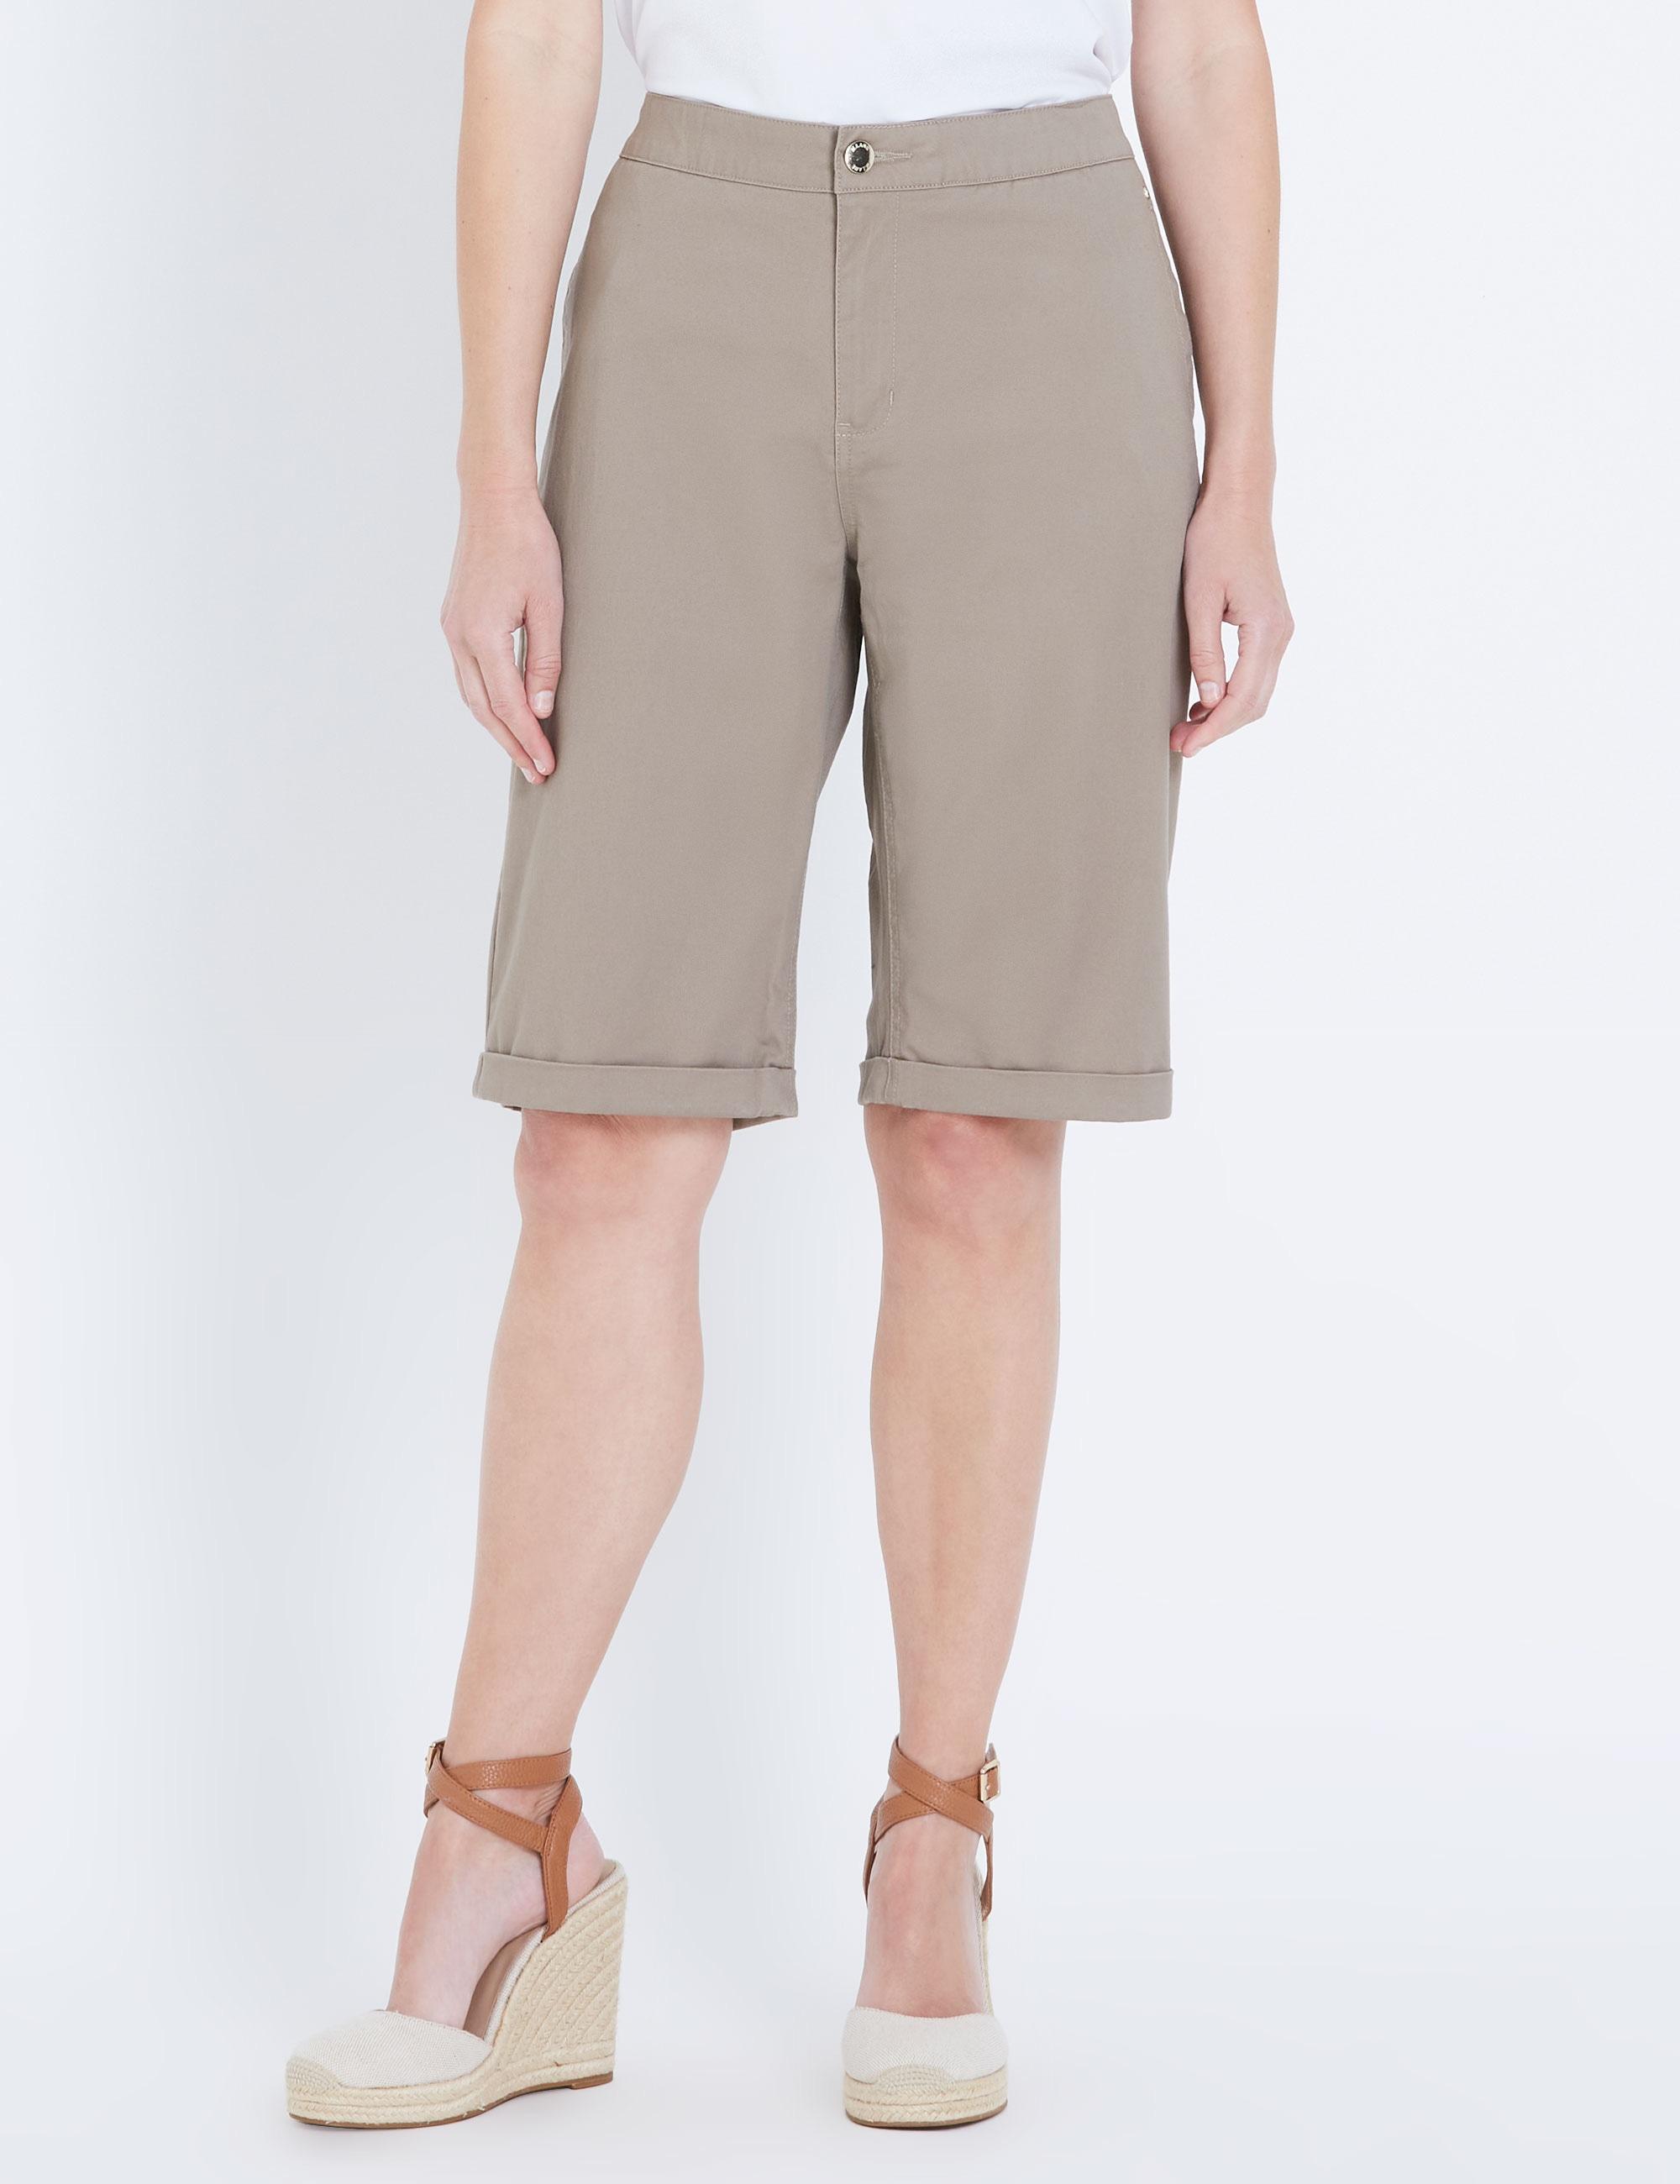 1051447140 1 - Women Fashion